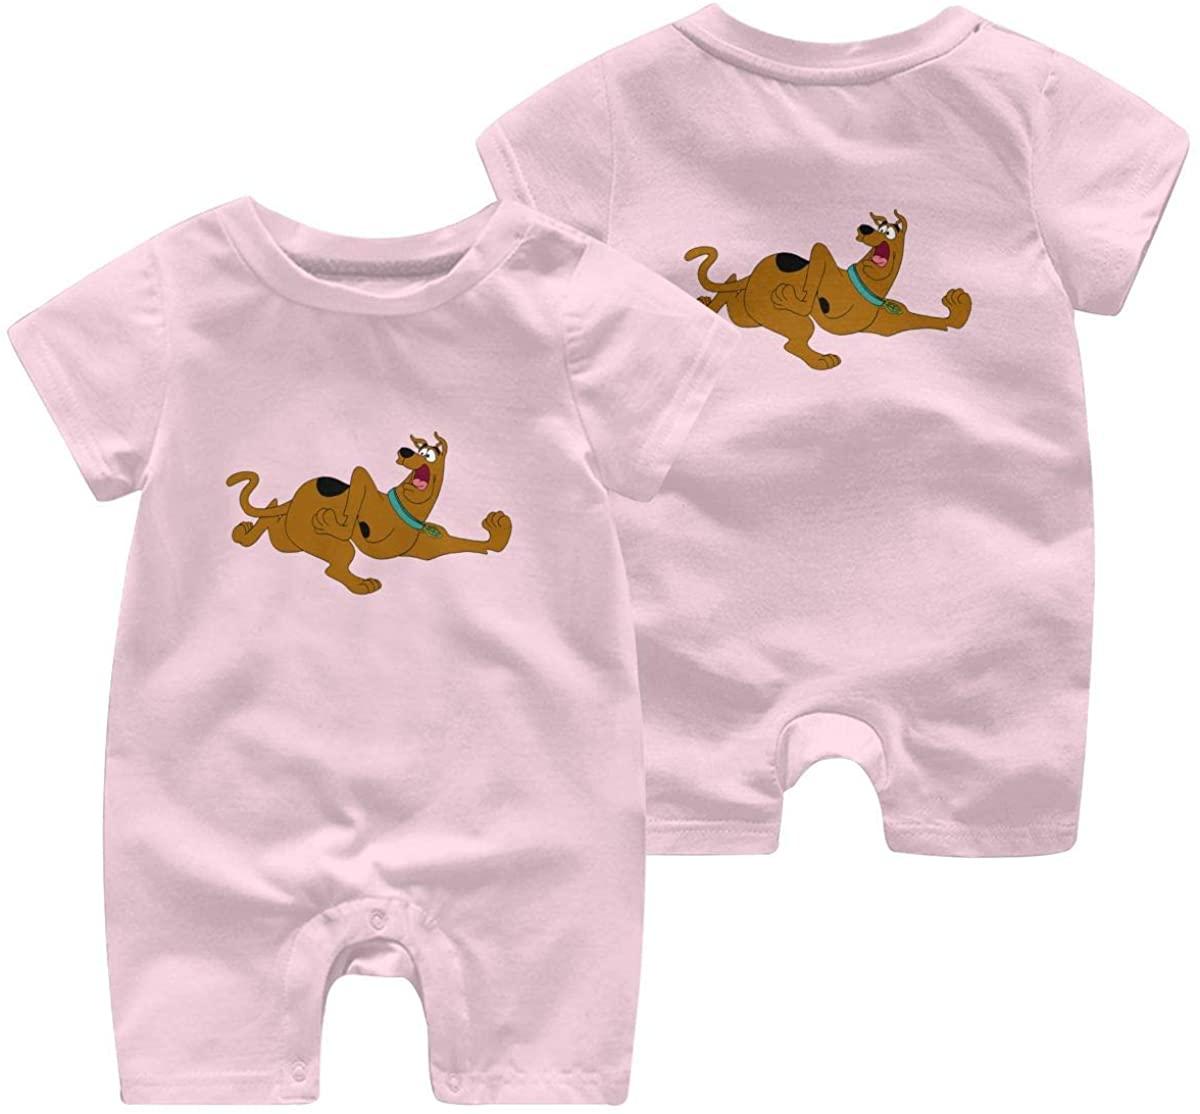 Scooby-Doo-Dog Leisure Baby Short Sleeve Jumpsuit Kid Breathable Baby Pajama Sleeper Cotton Romper